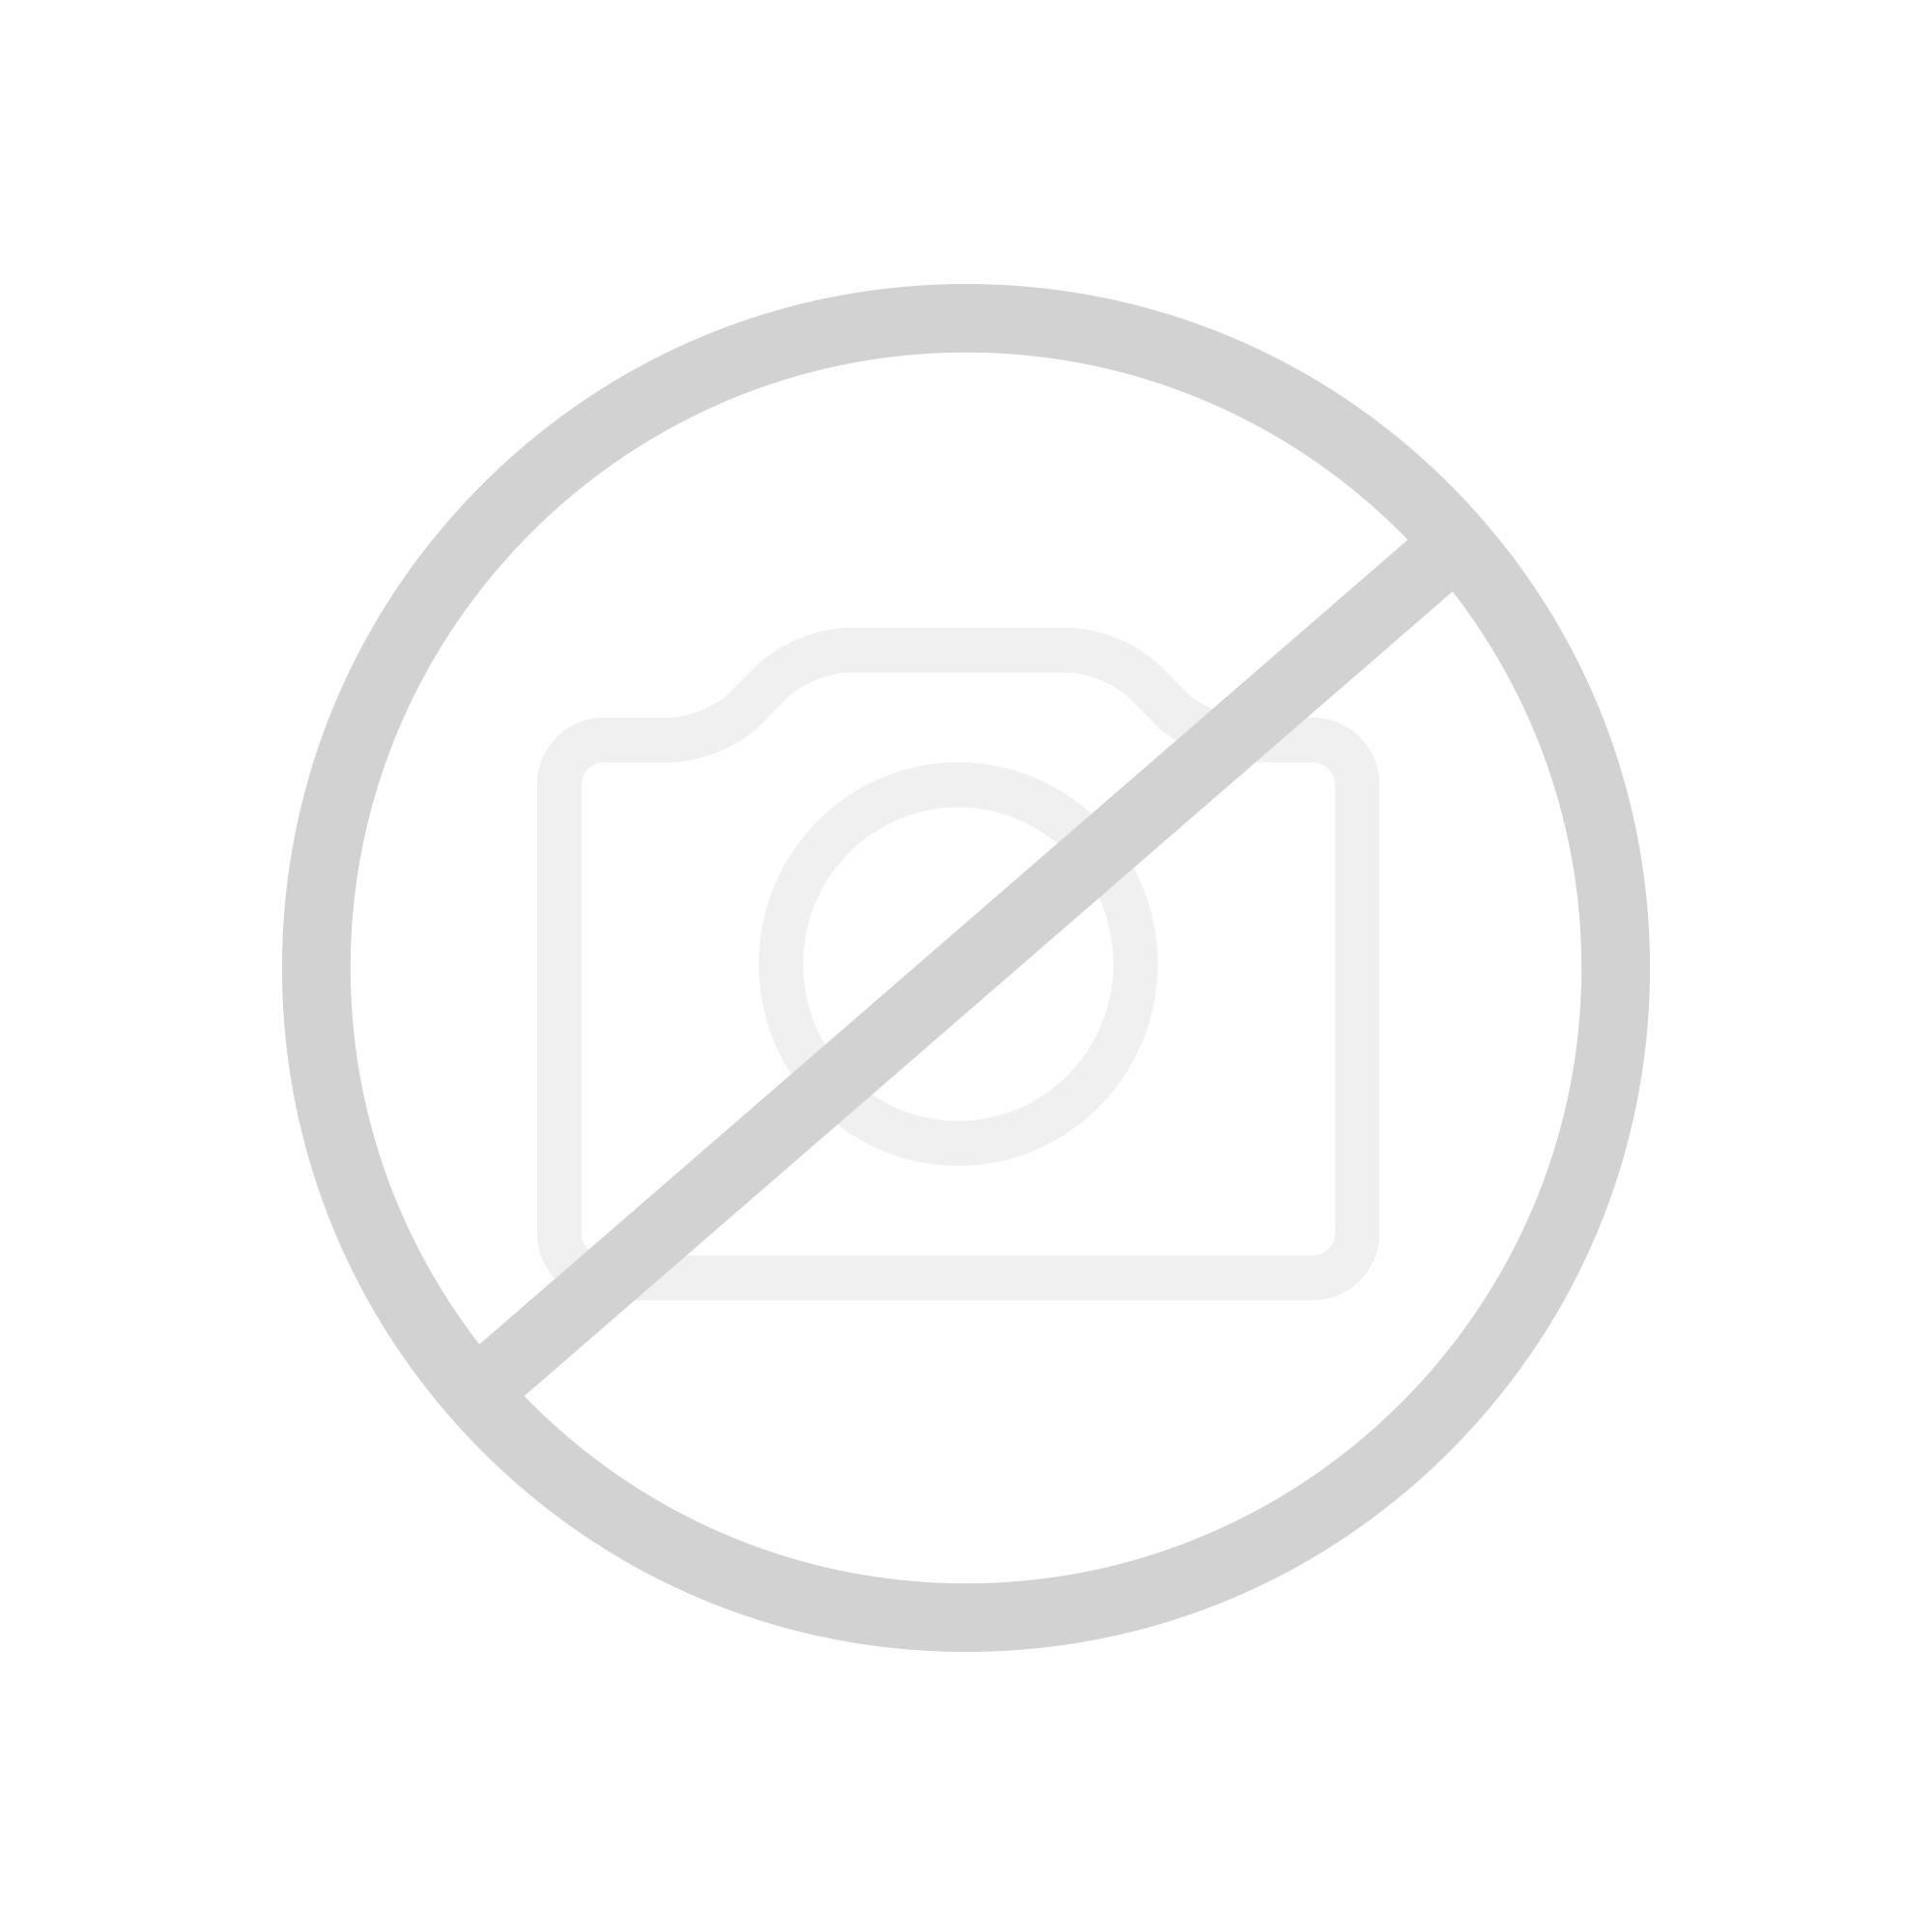 JOOP! Produkte Online Bestellen Im REUTER Shop